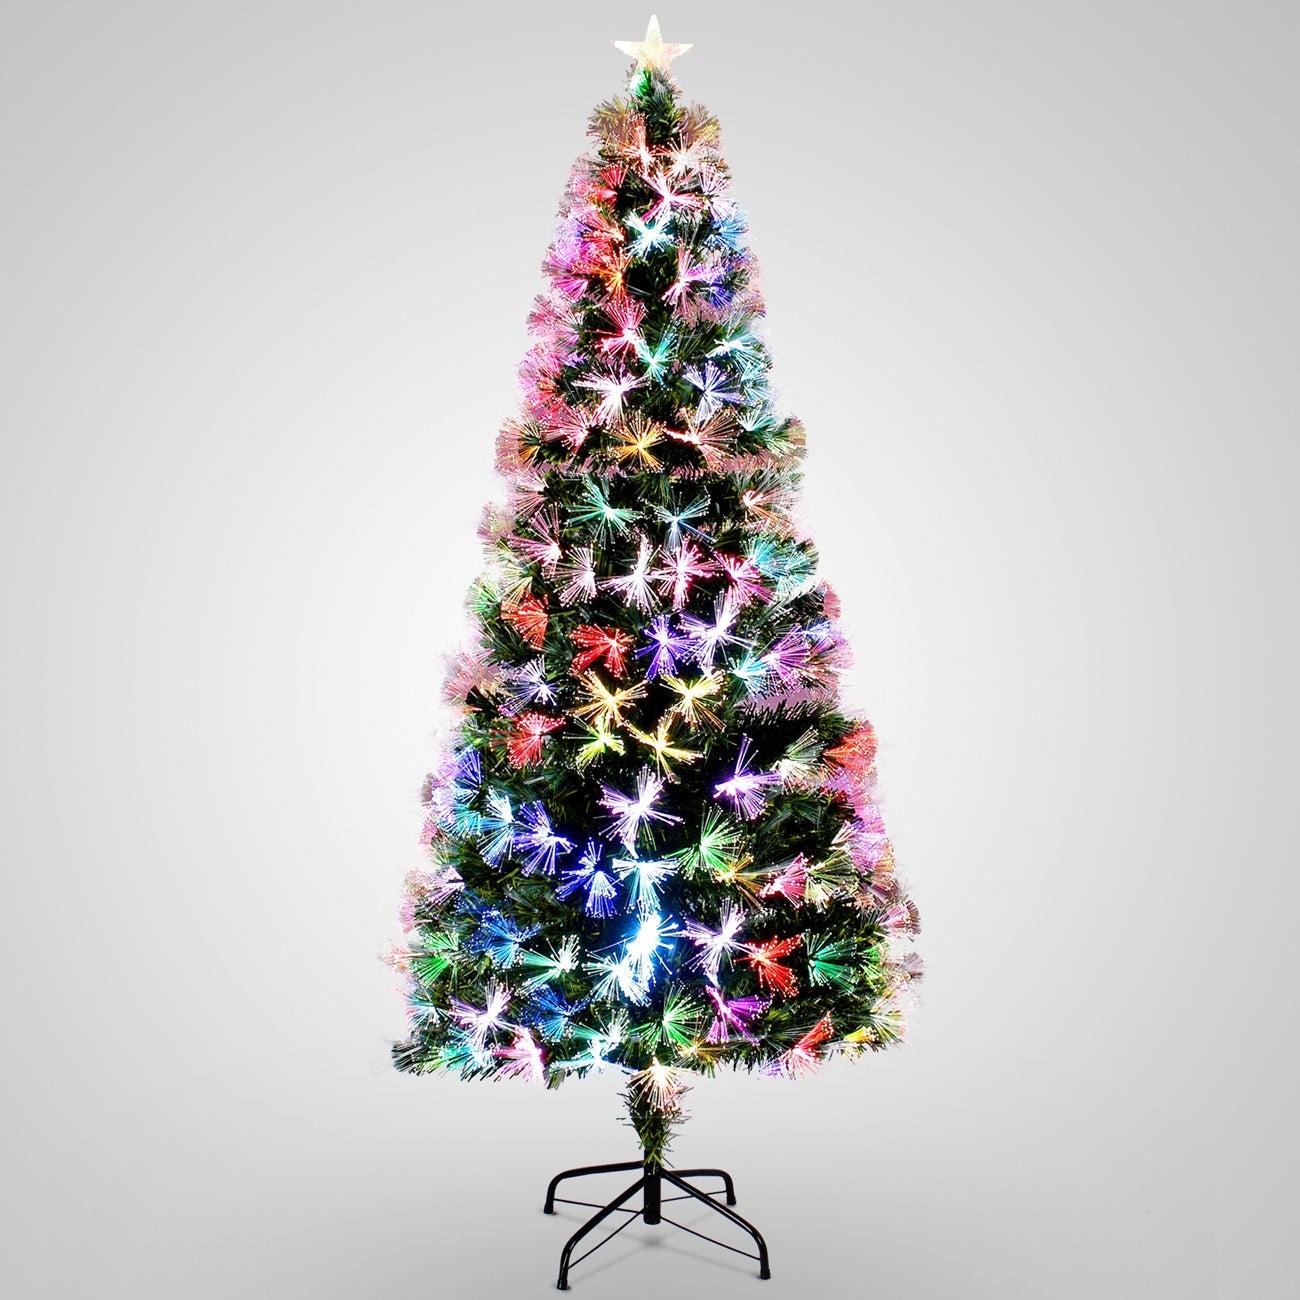 Belleze 6ft Artificial Christmas Tree Fiber Optic Color Light W Stand Overstock 24219150